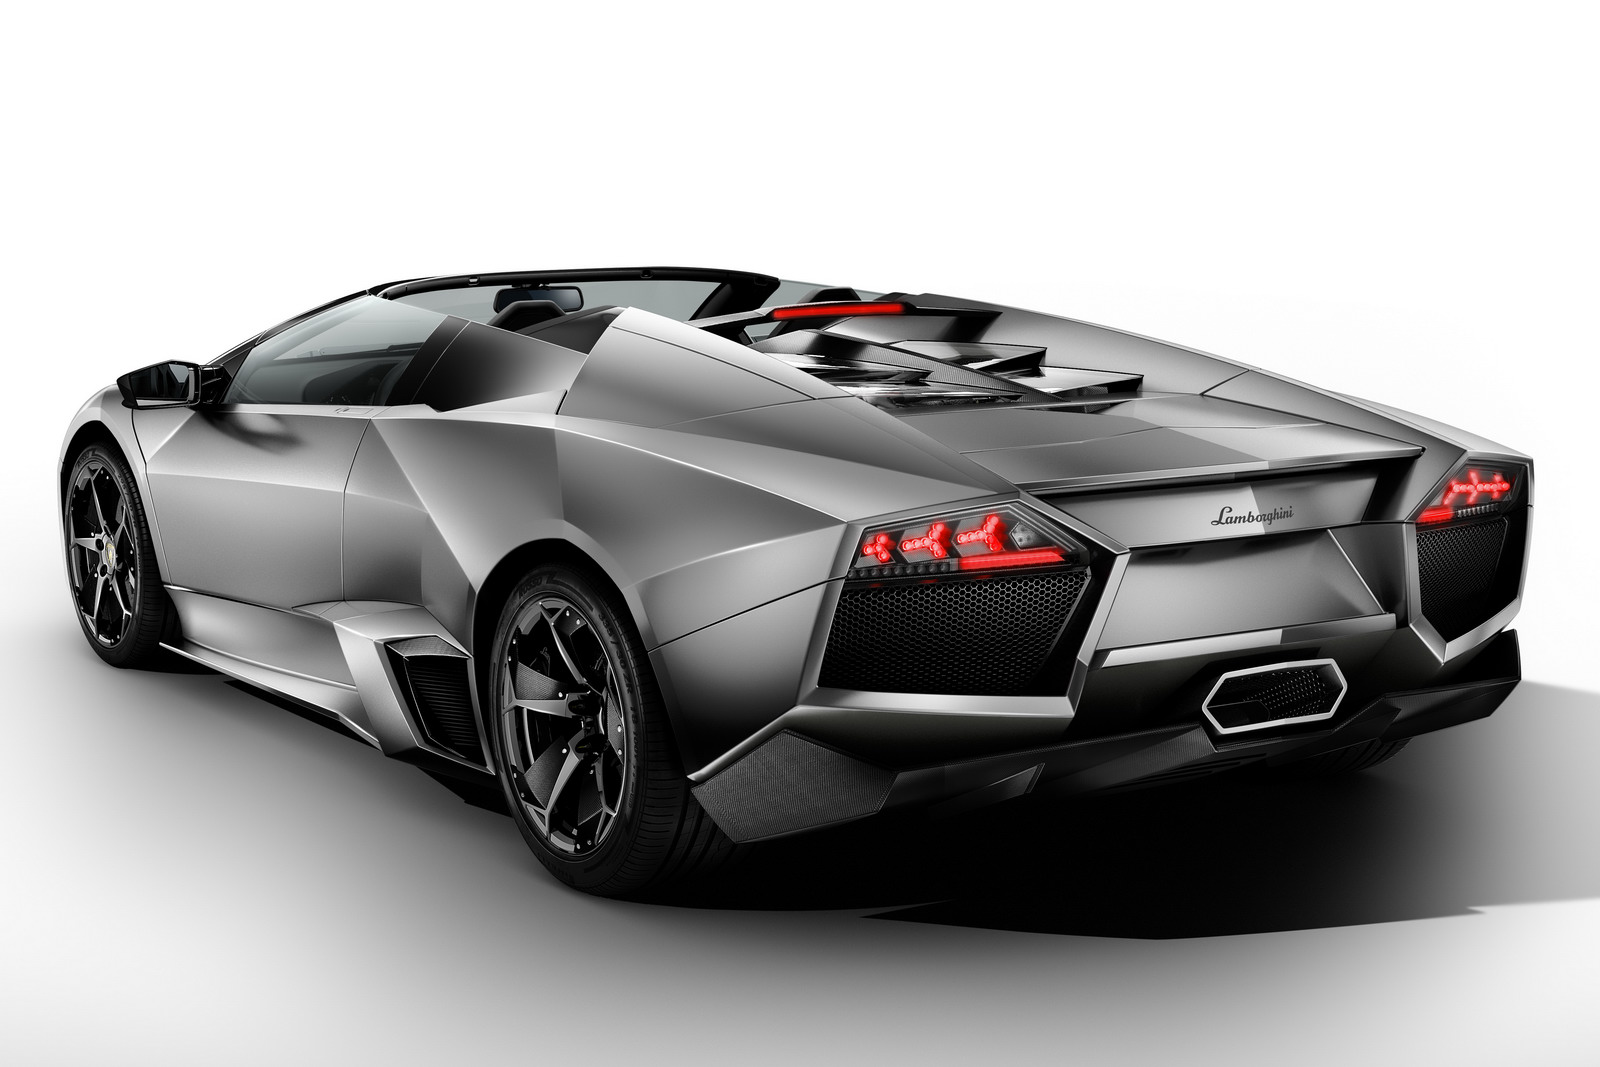 Tesla roadster review uk dating 5